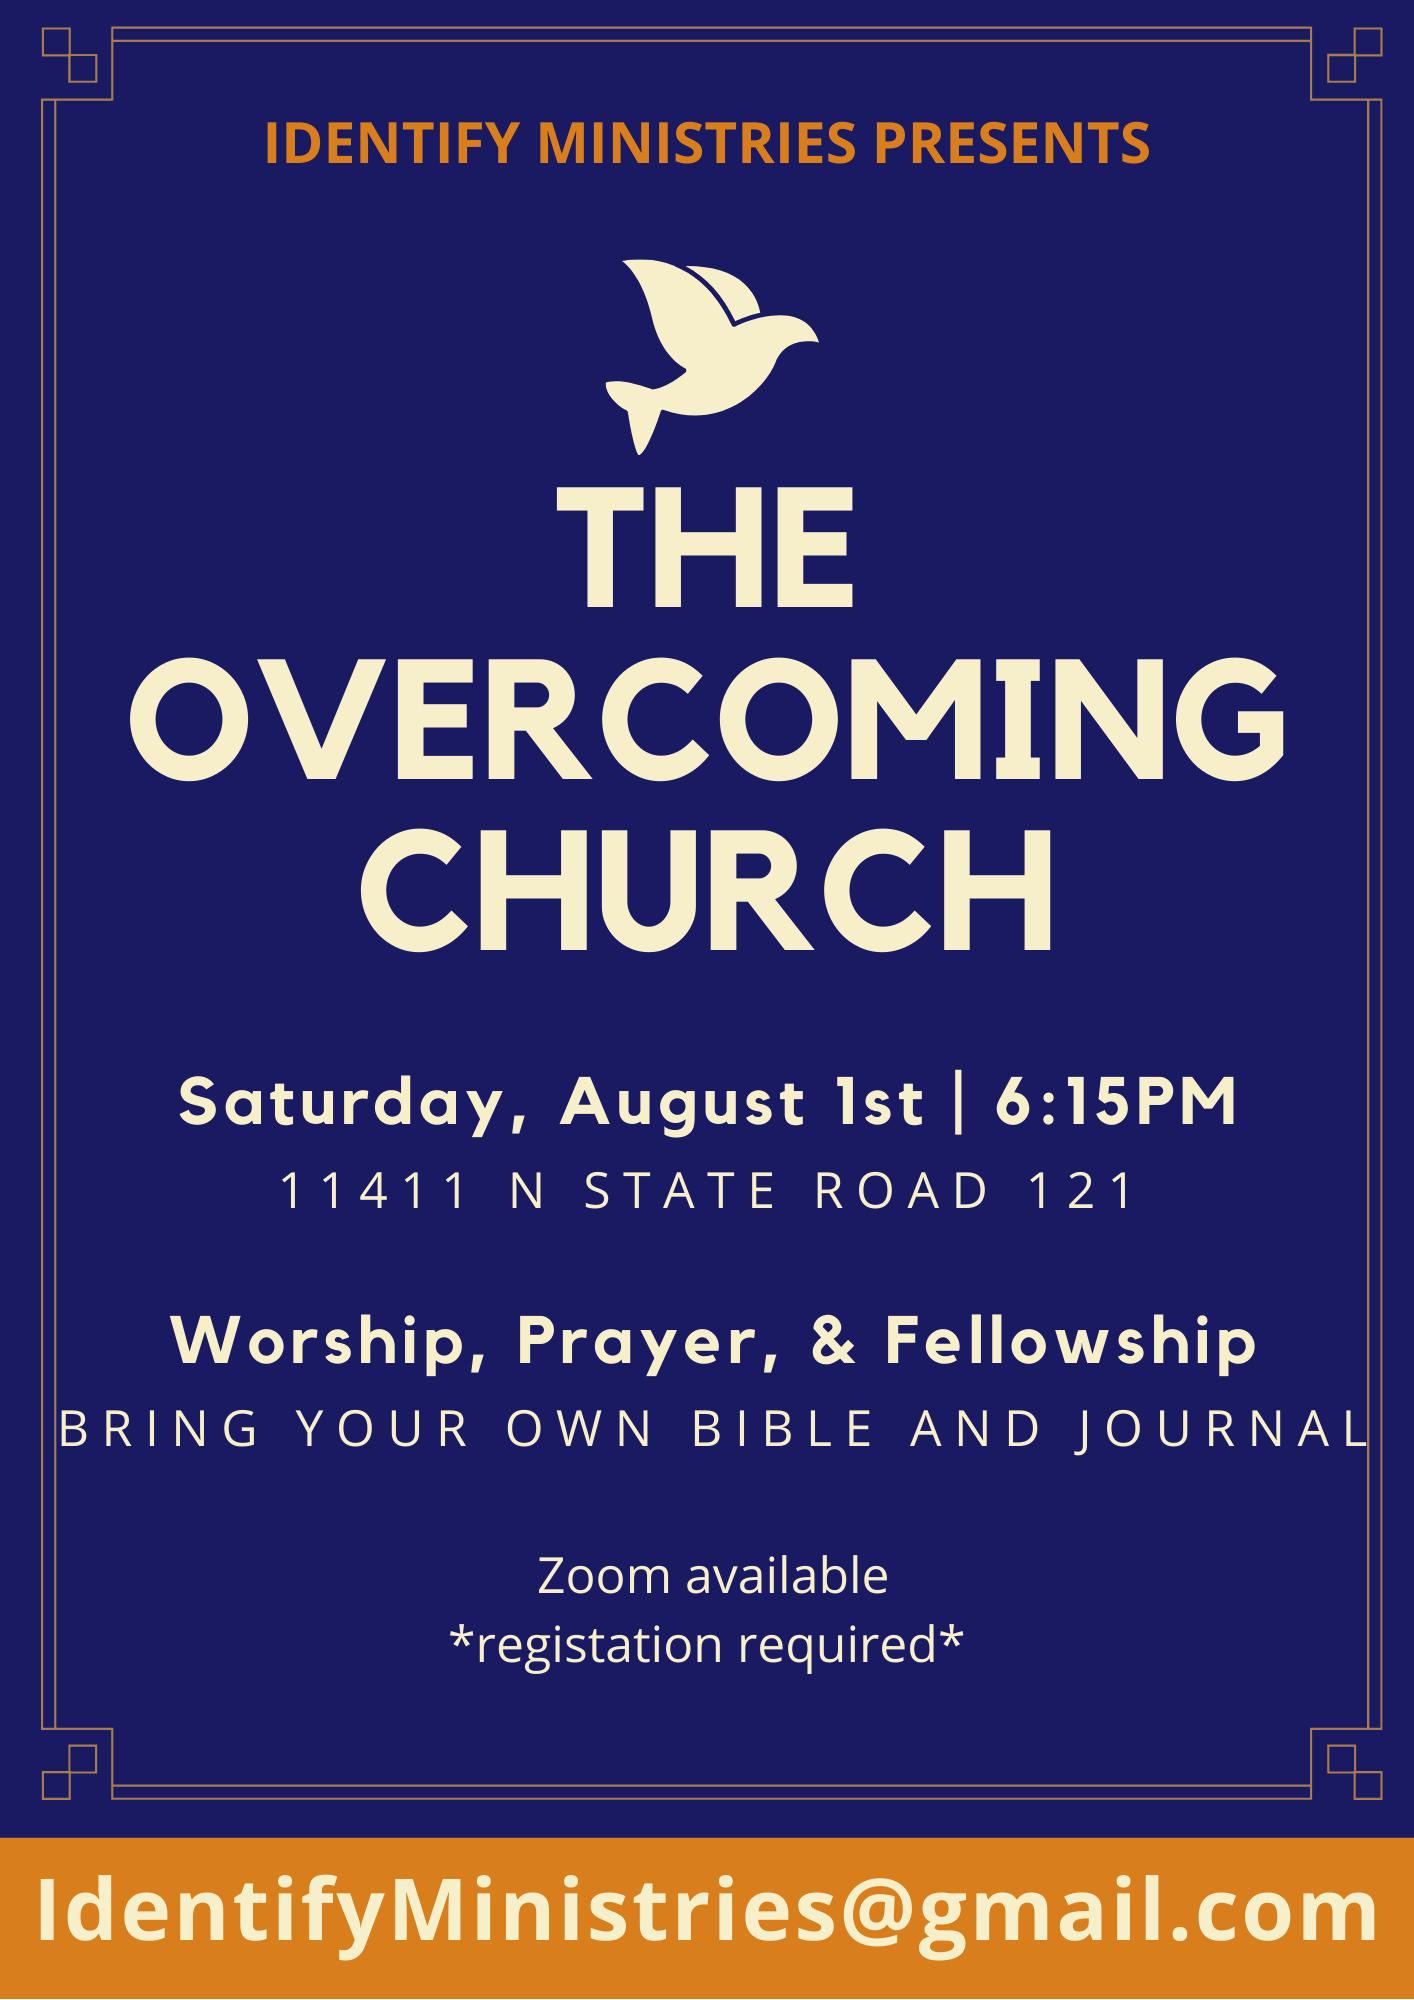 The Overcoming Church